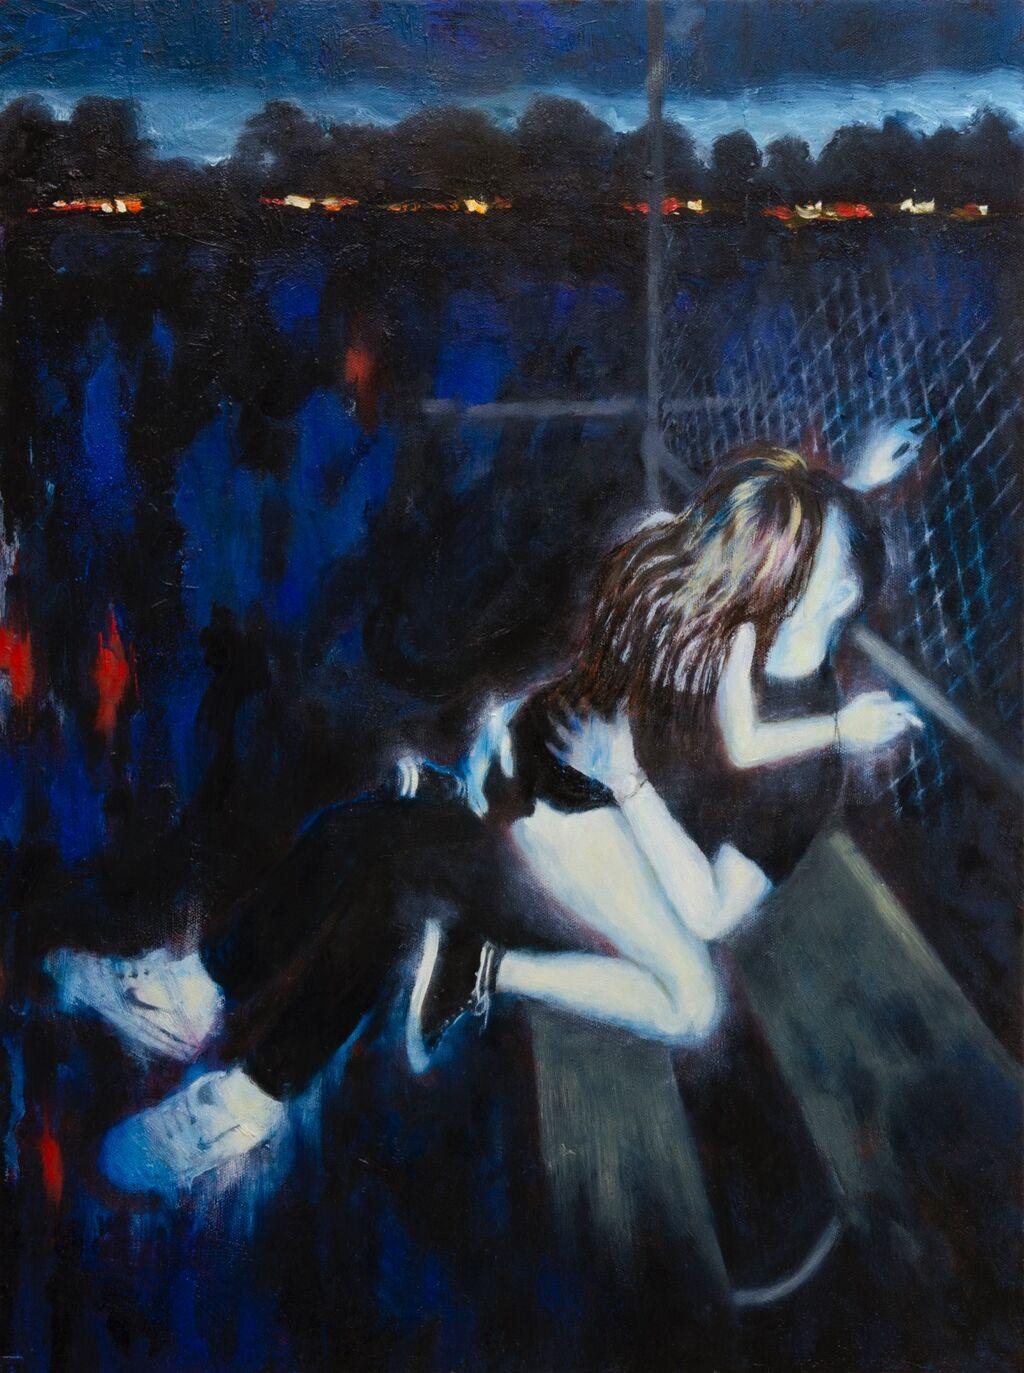 'Flux', 46 x 61 cm, oil on canvas